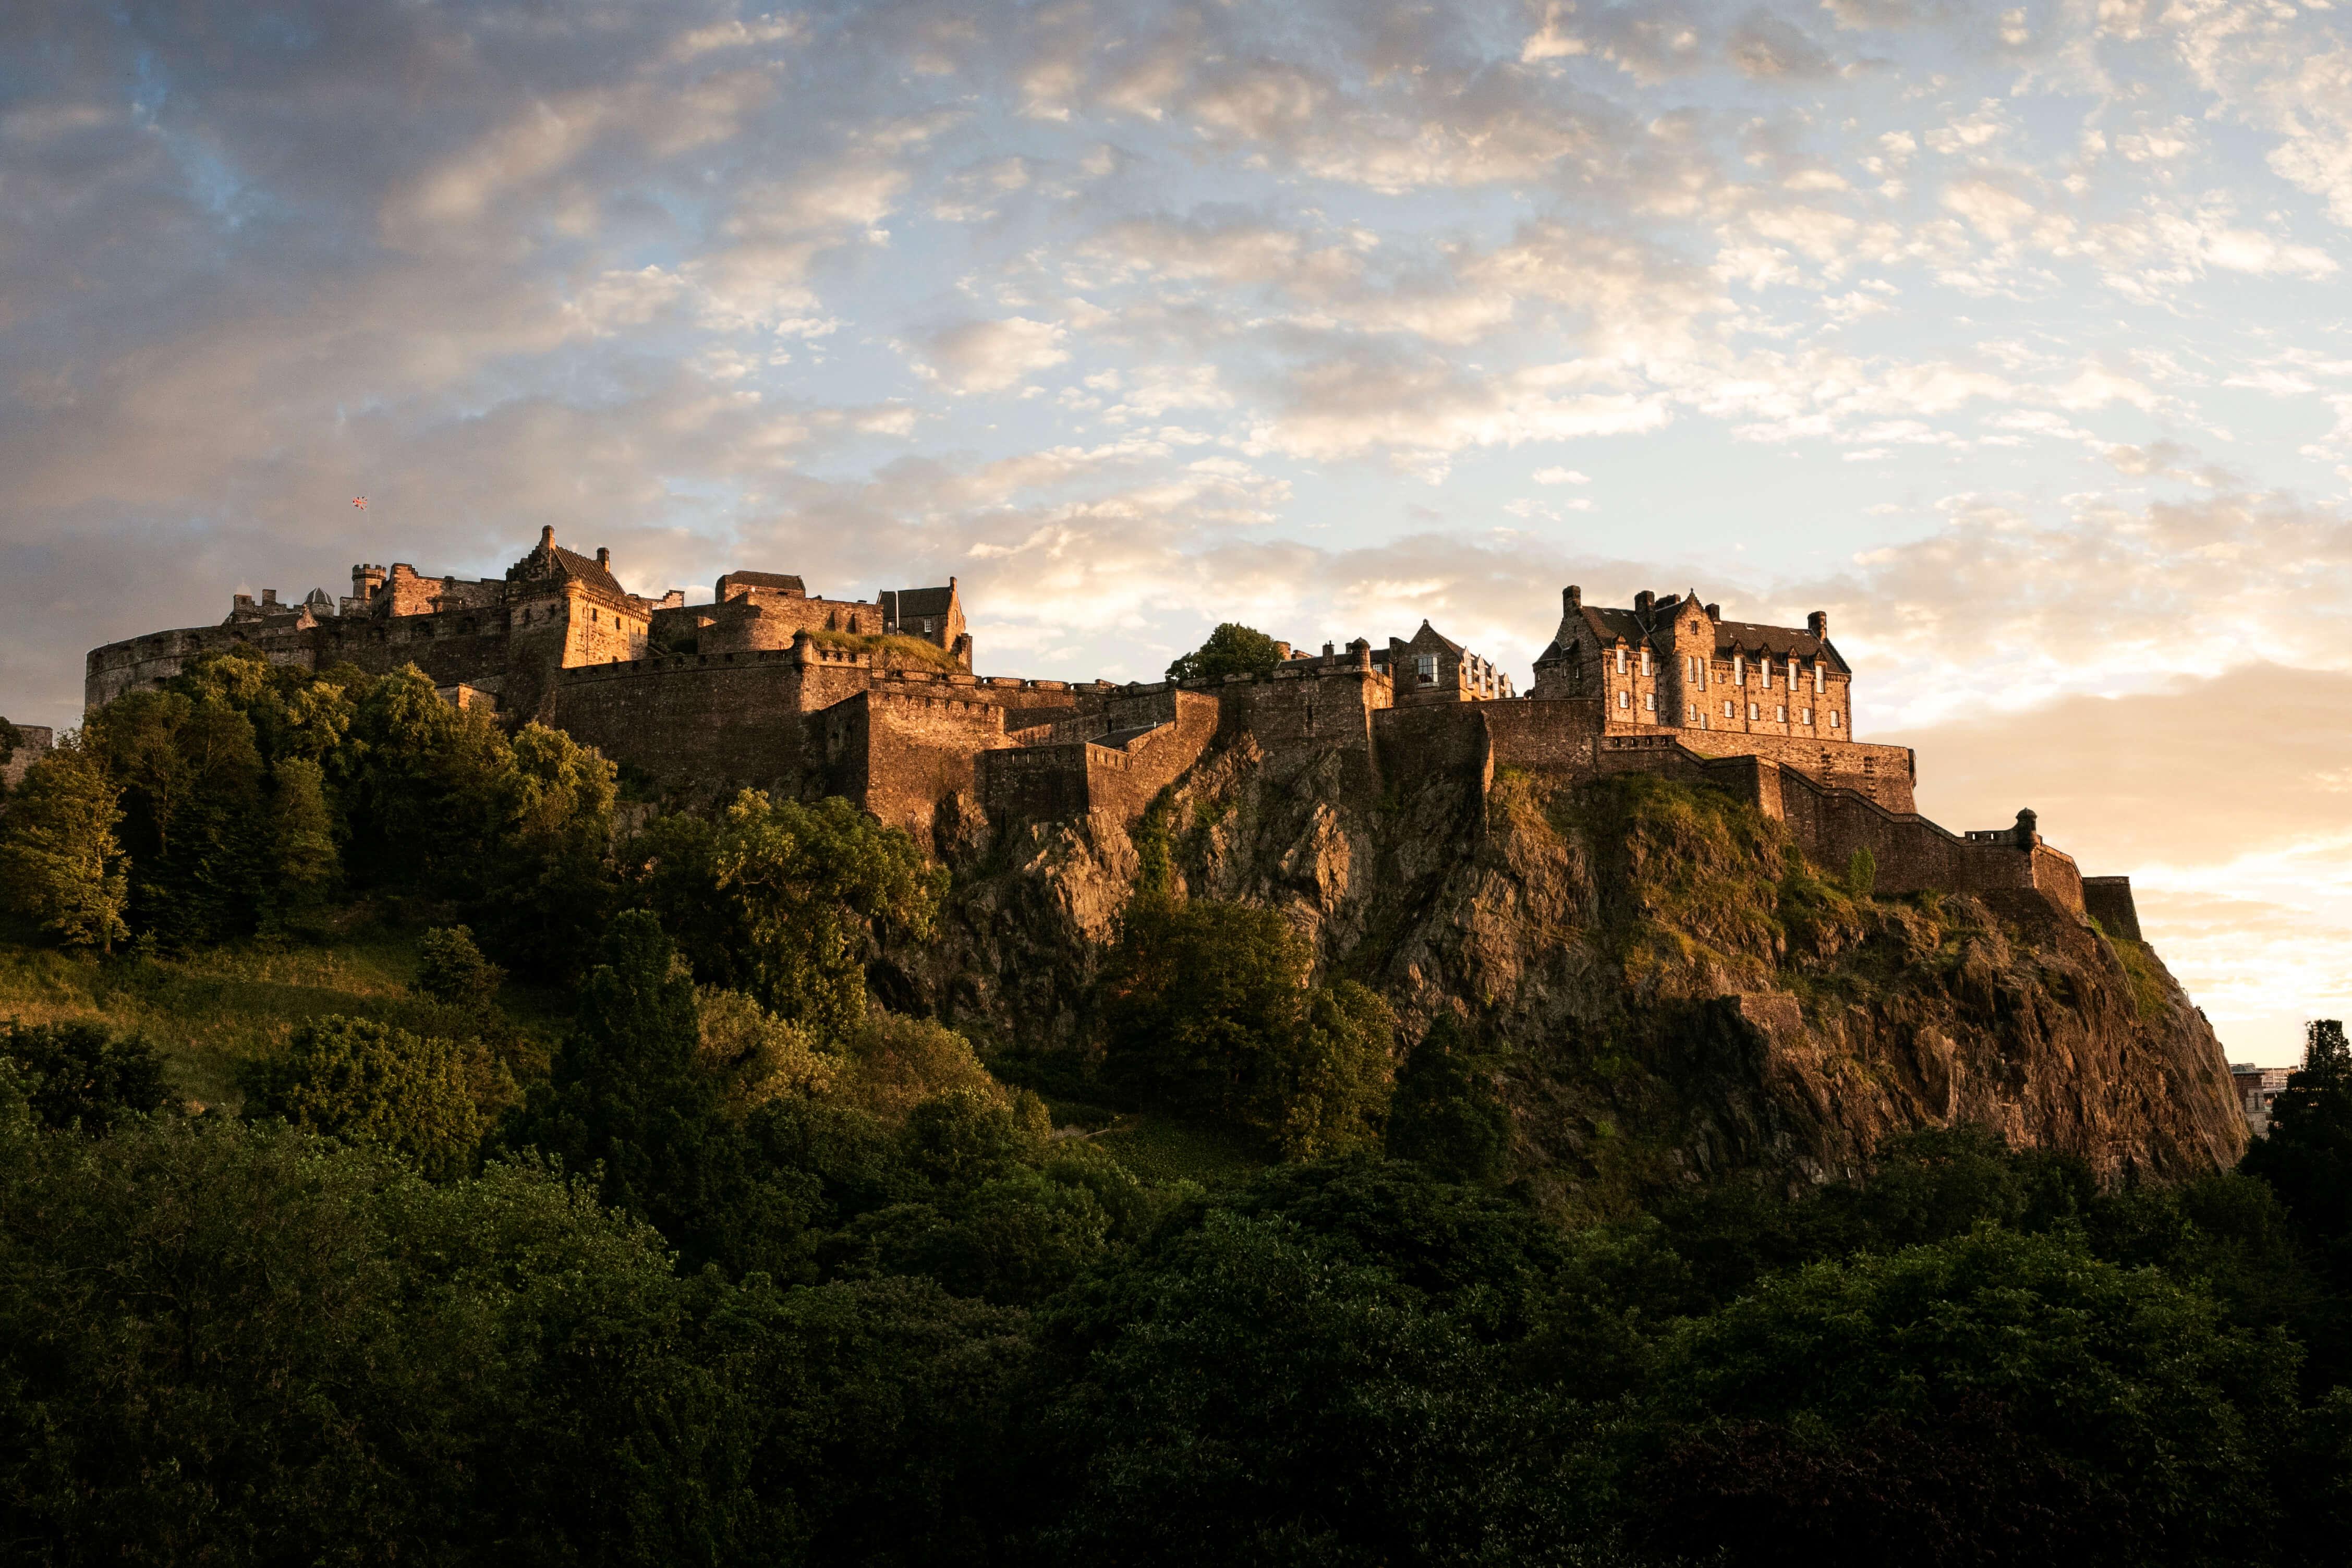 Sunset over Edinburgh Castle, one of Scotland's most iconic sites.